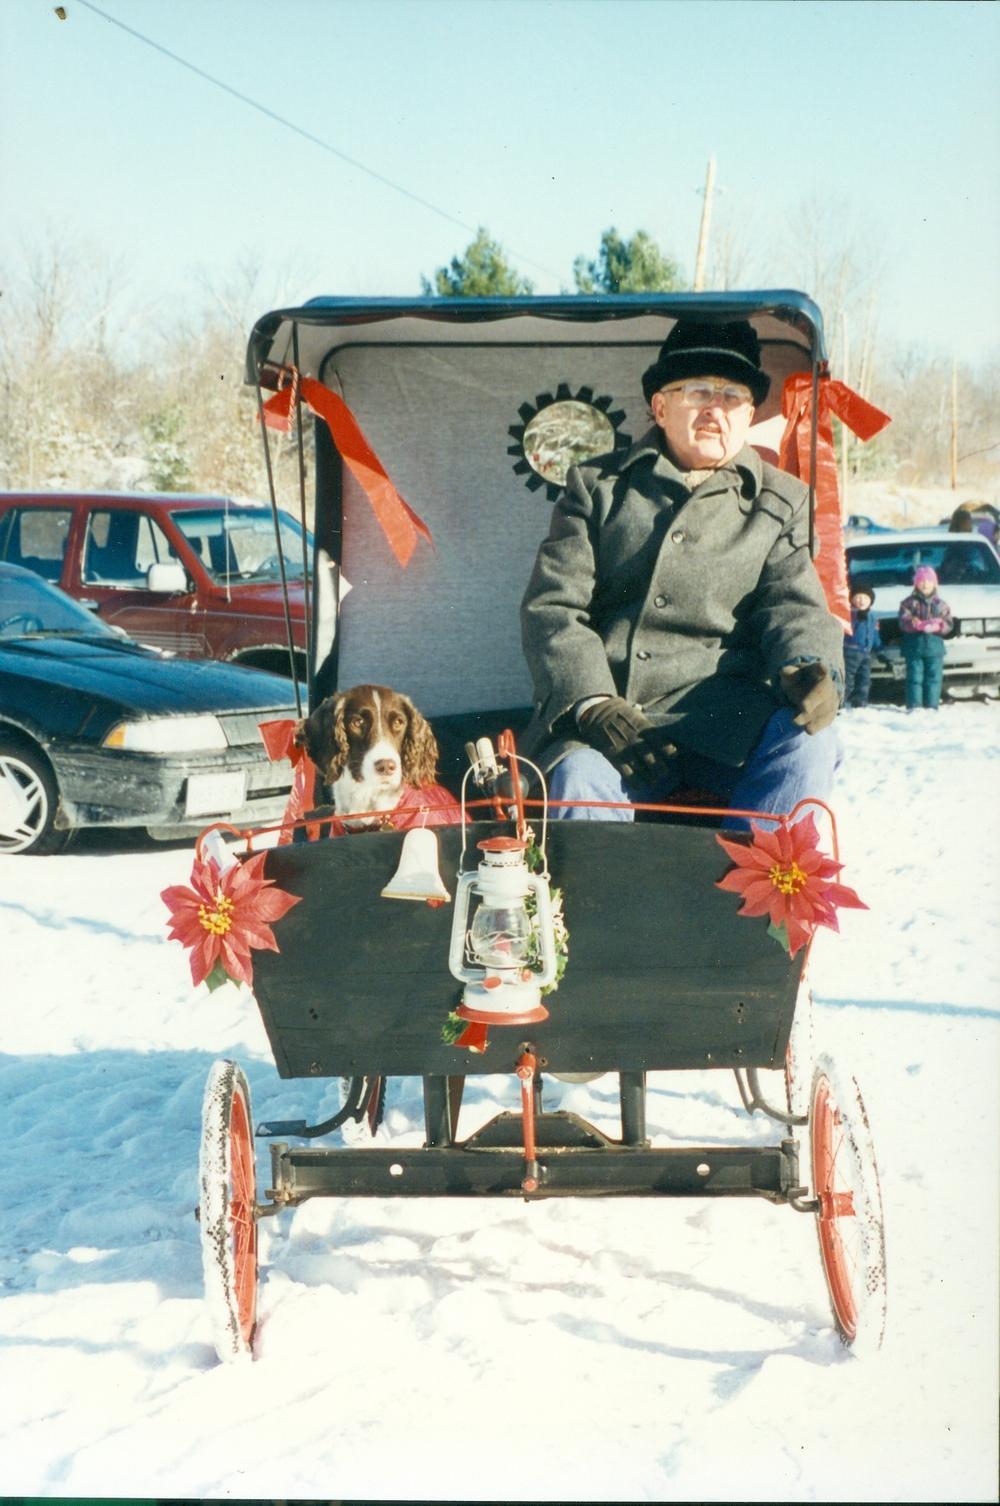 Cordova Santa Claus Parade 1990